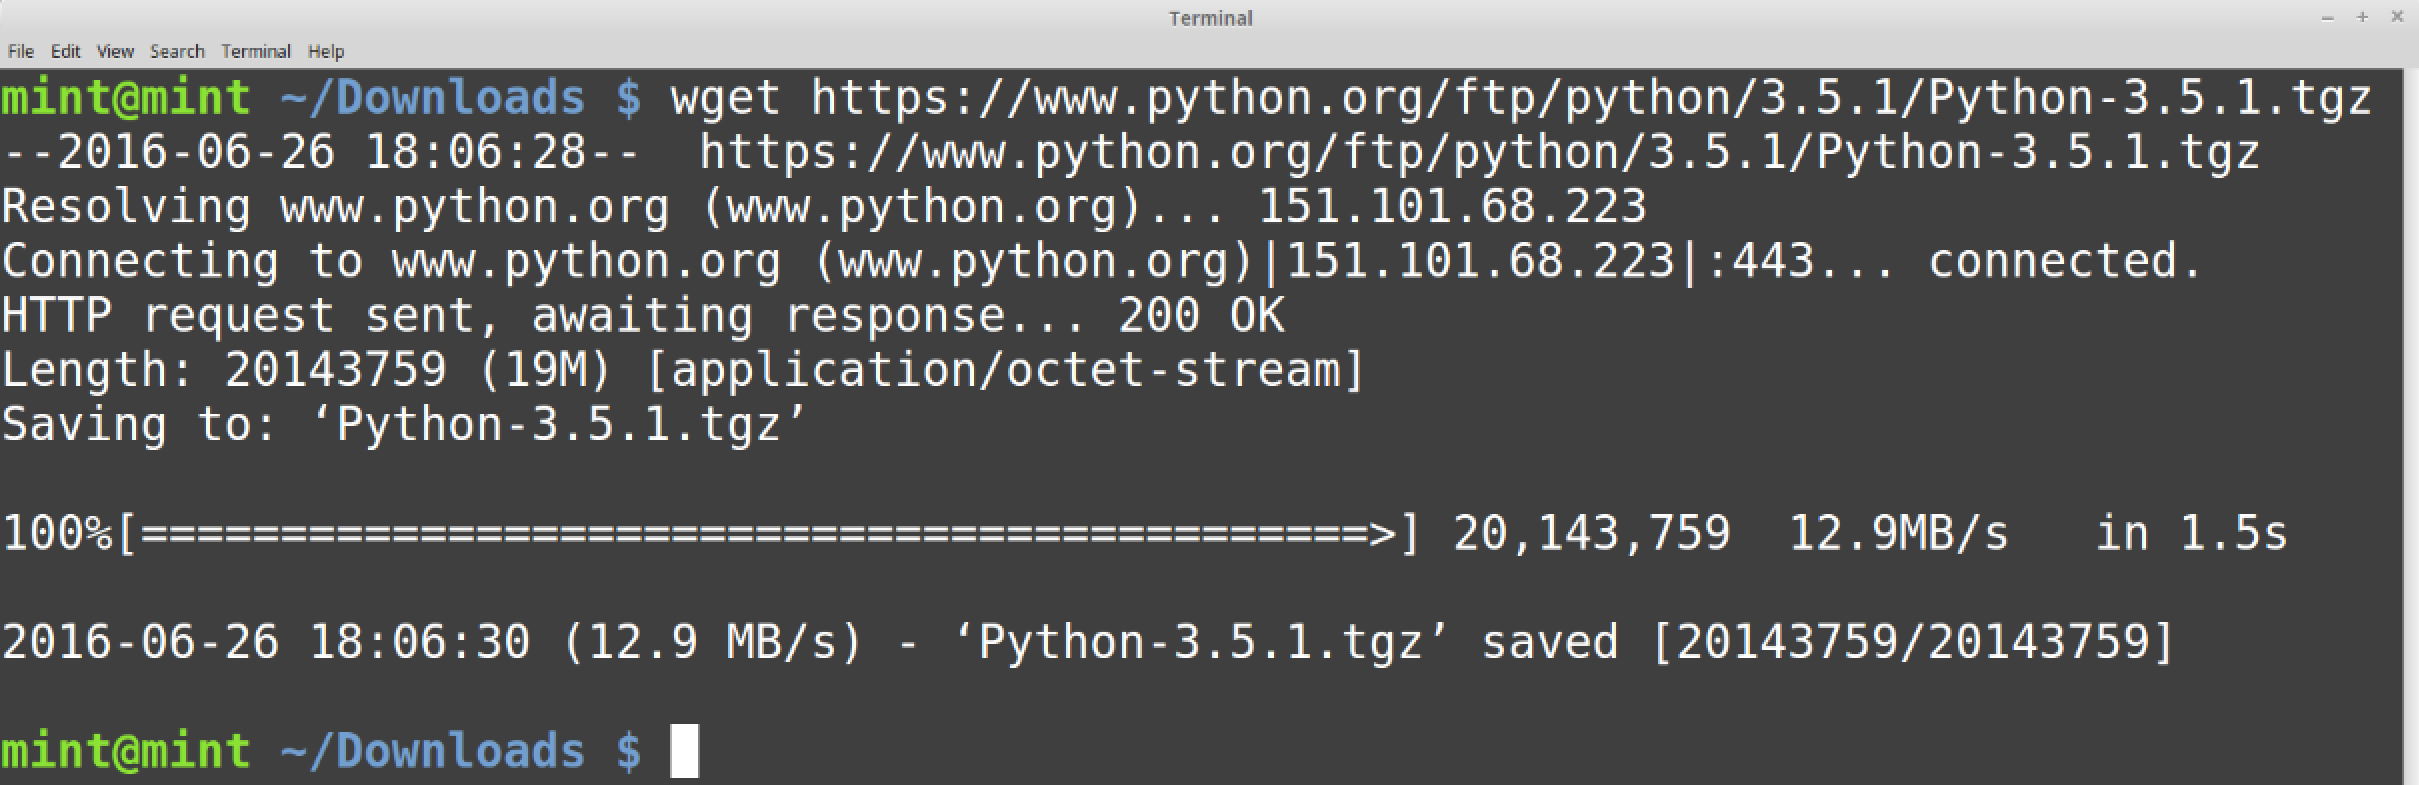 Setting Up Python 3, Django & Gunicorn on Linux Mint 17 3 - Full